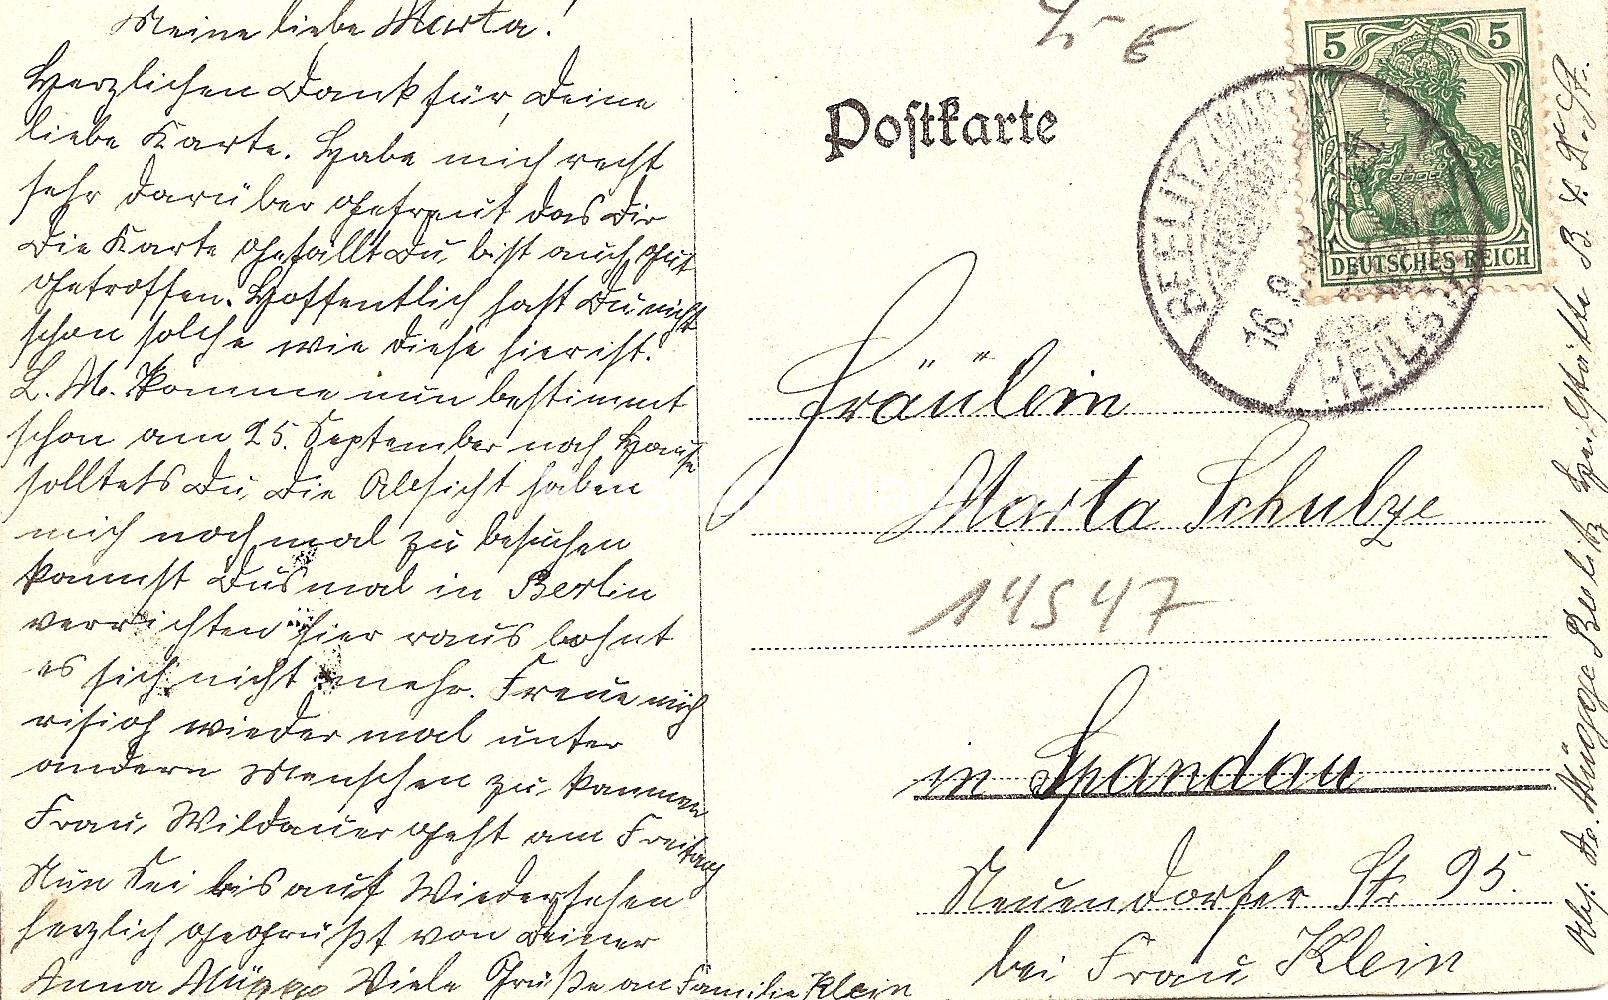 1908 09 16